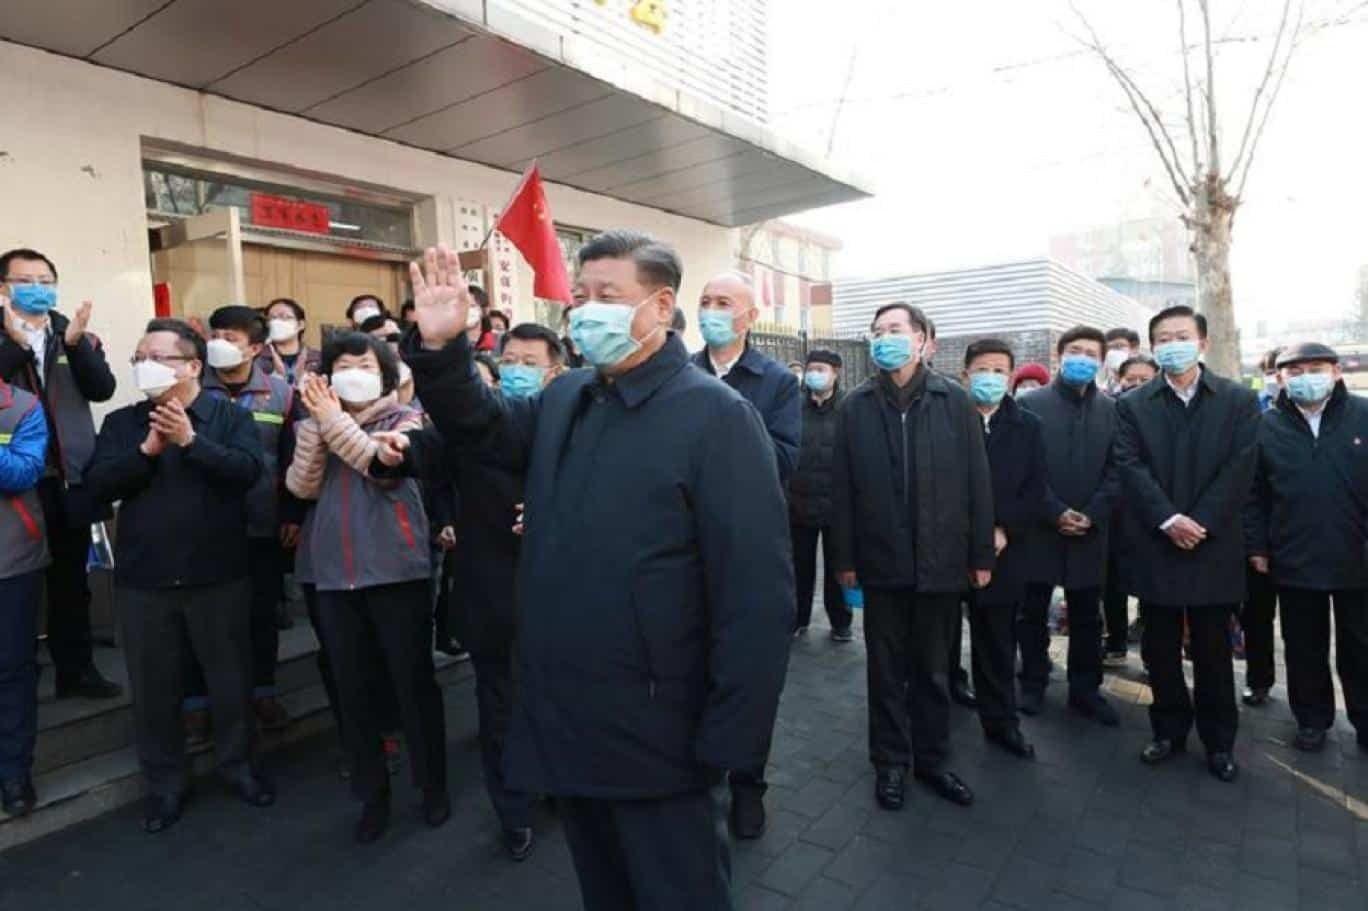 فيروس كورونا يشعل حرب اتهامات بين واشنطن وبكين